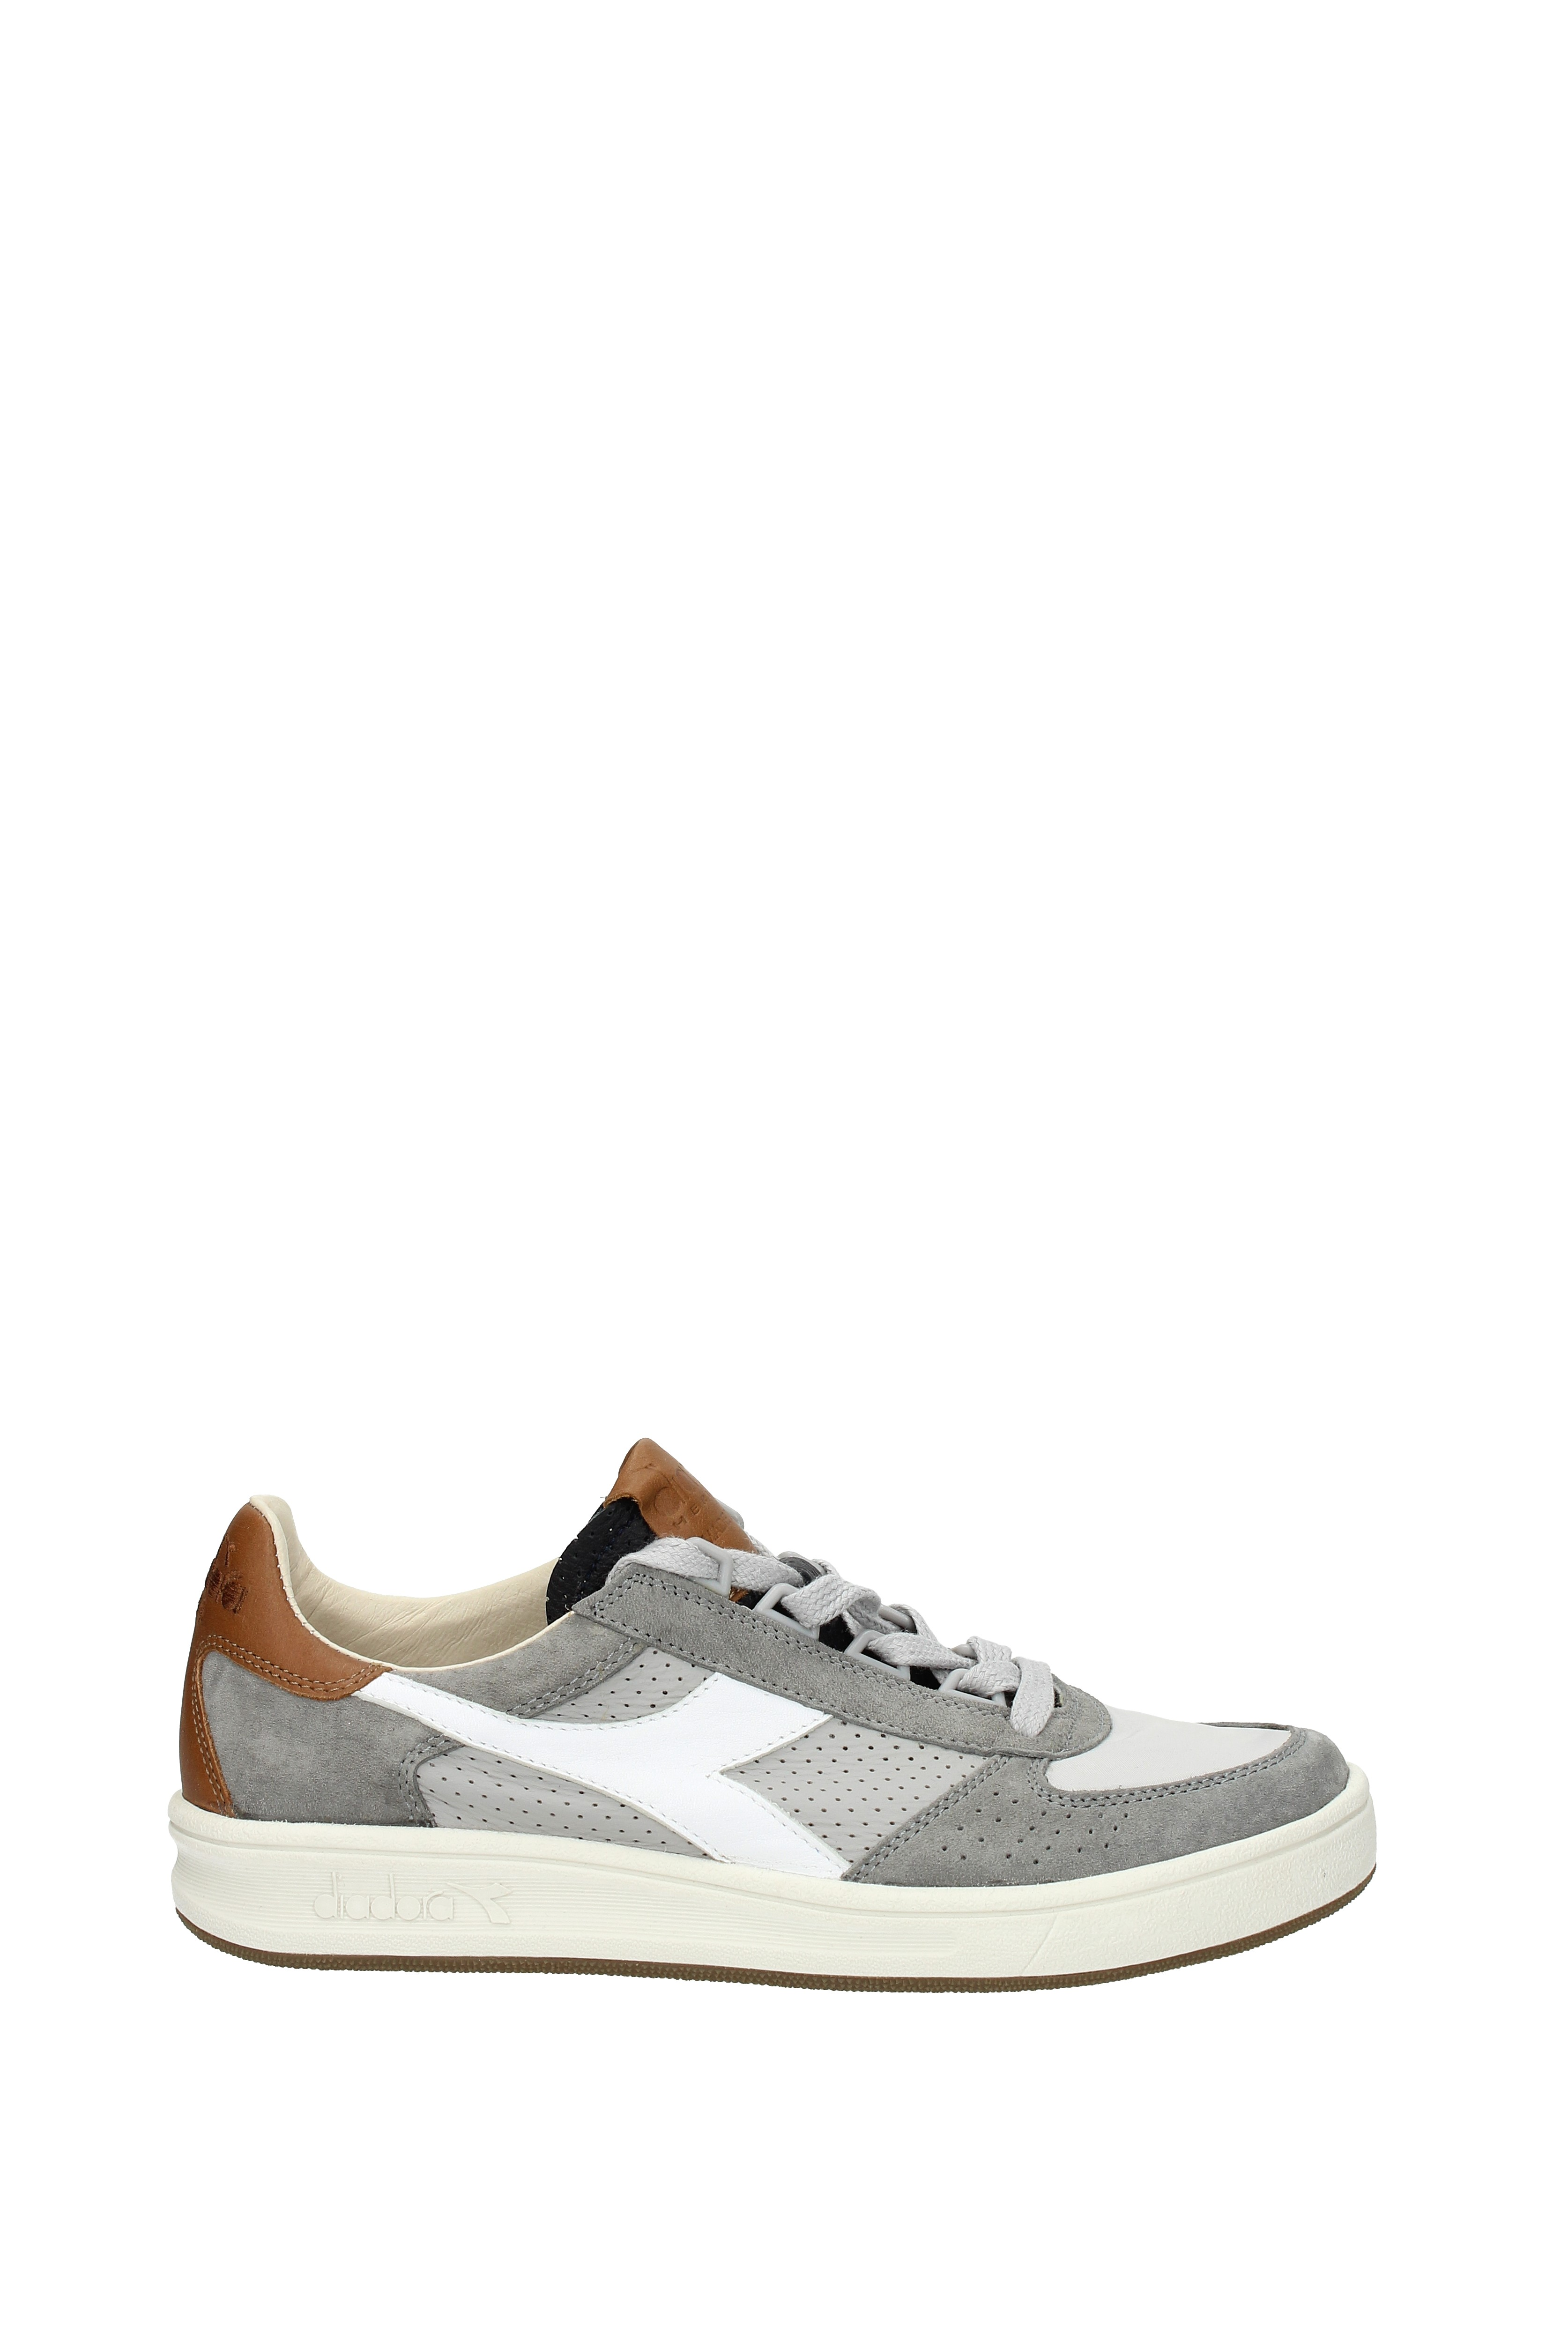 Sneakers Diadora Diadora Diadora Heritage b elite ita 2 Herren - Leder (20117336301) 0c812d